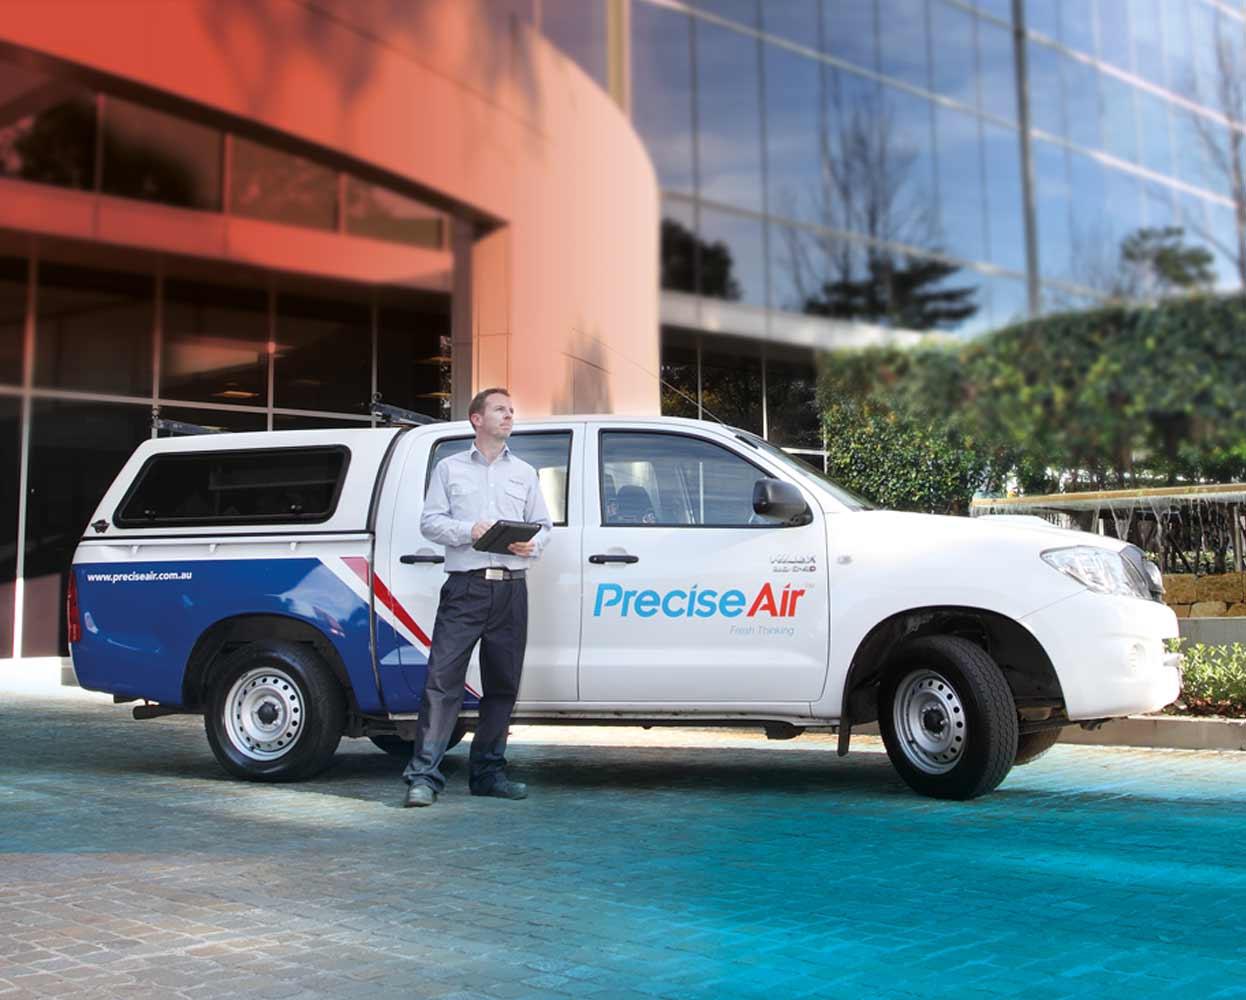 Precise Air Branding Vehicle signage ute